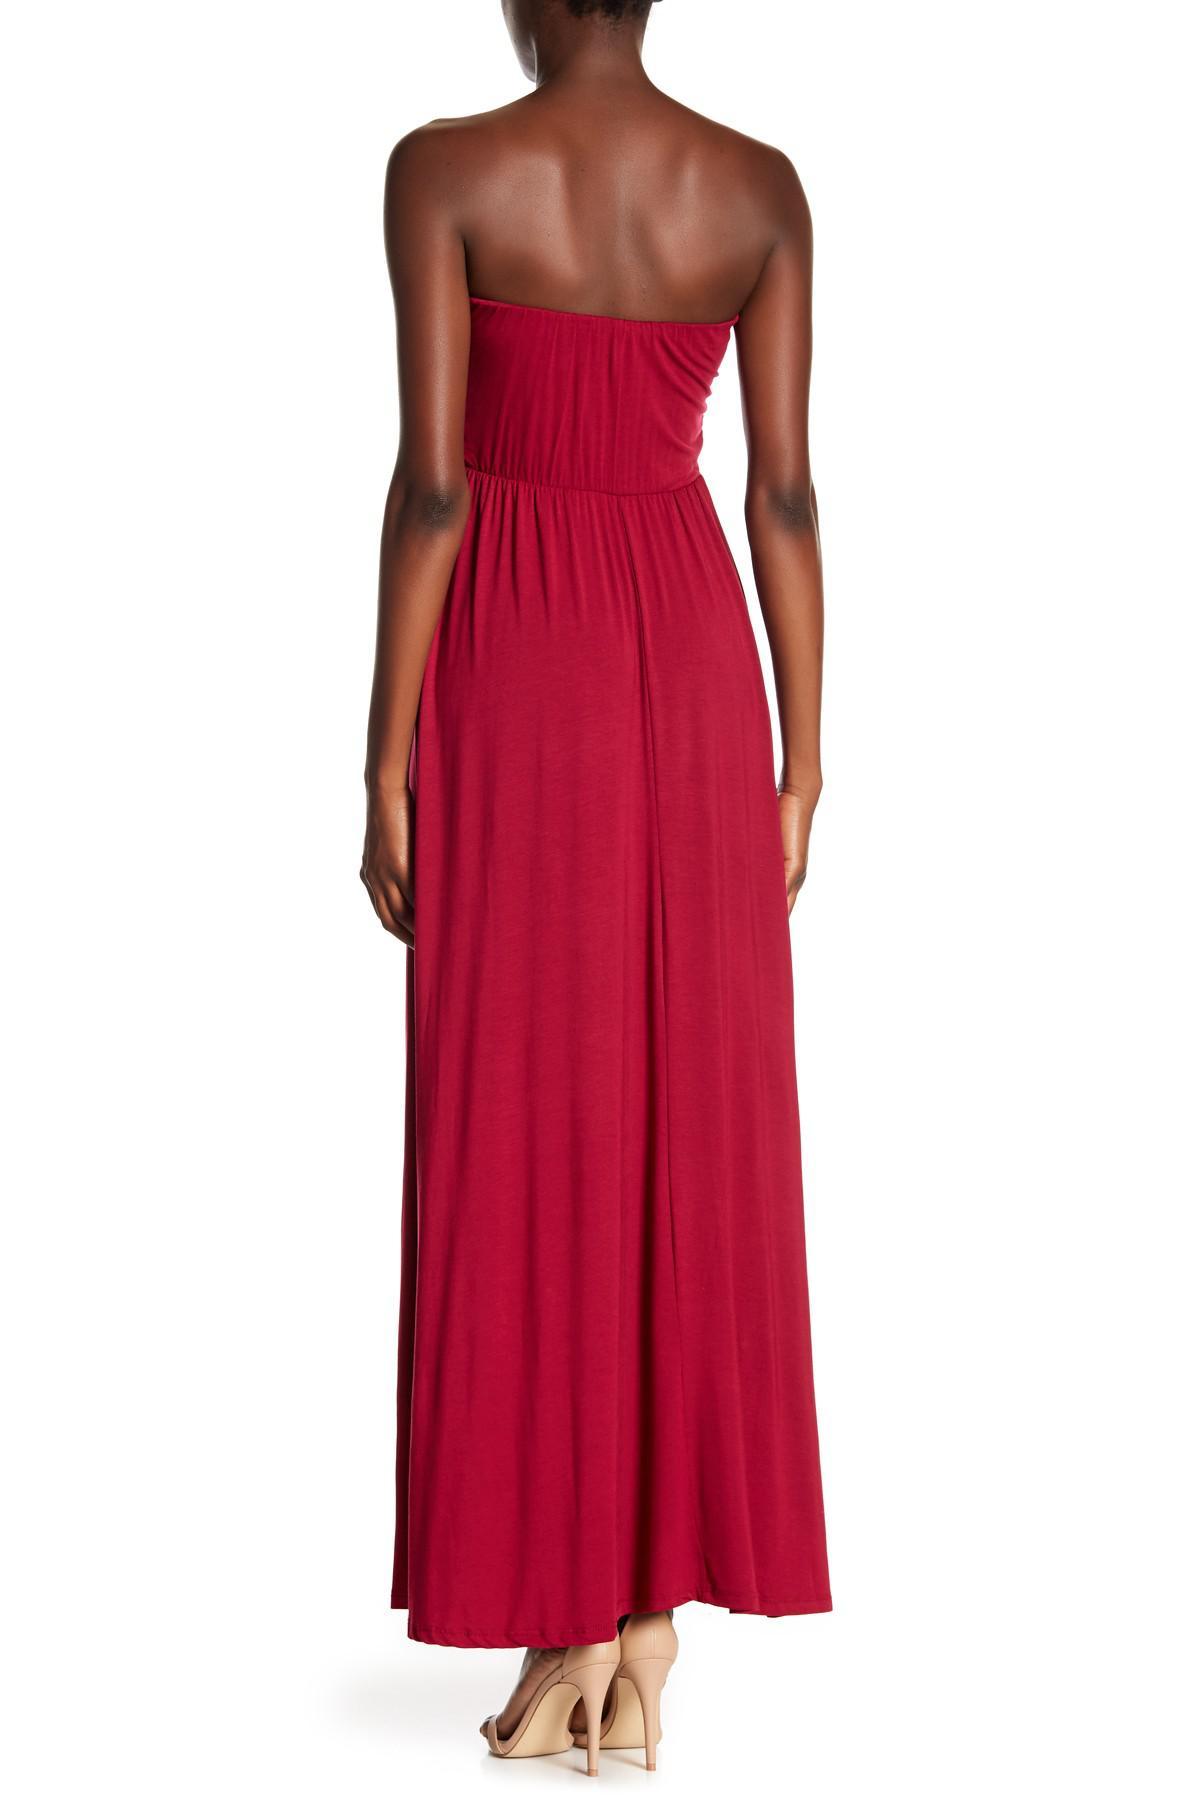 599ab1da3c9 West Kei - Red Strapless Maxi Dress - Lyst. View fullscreen